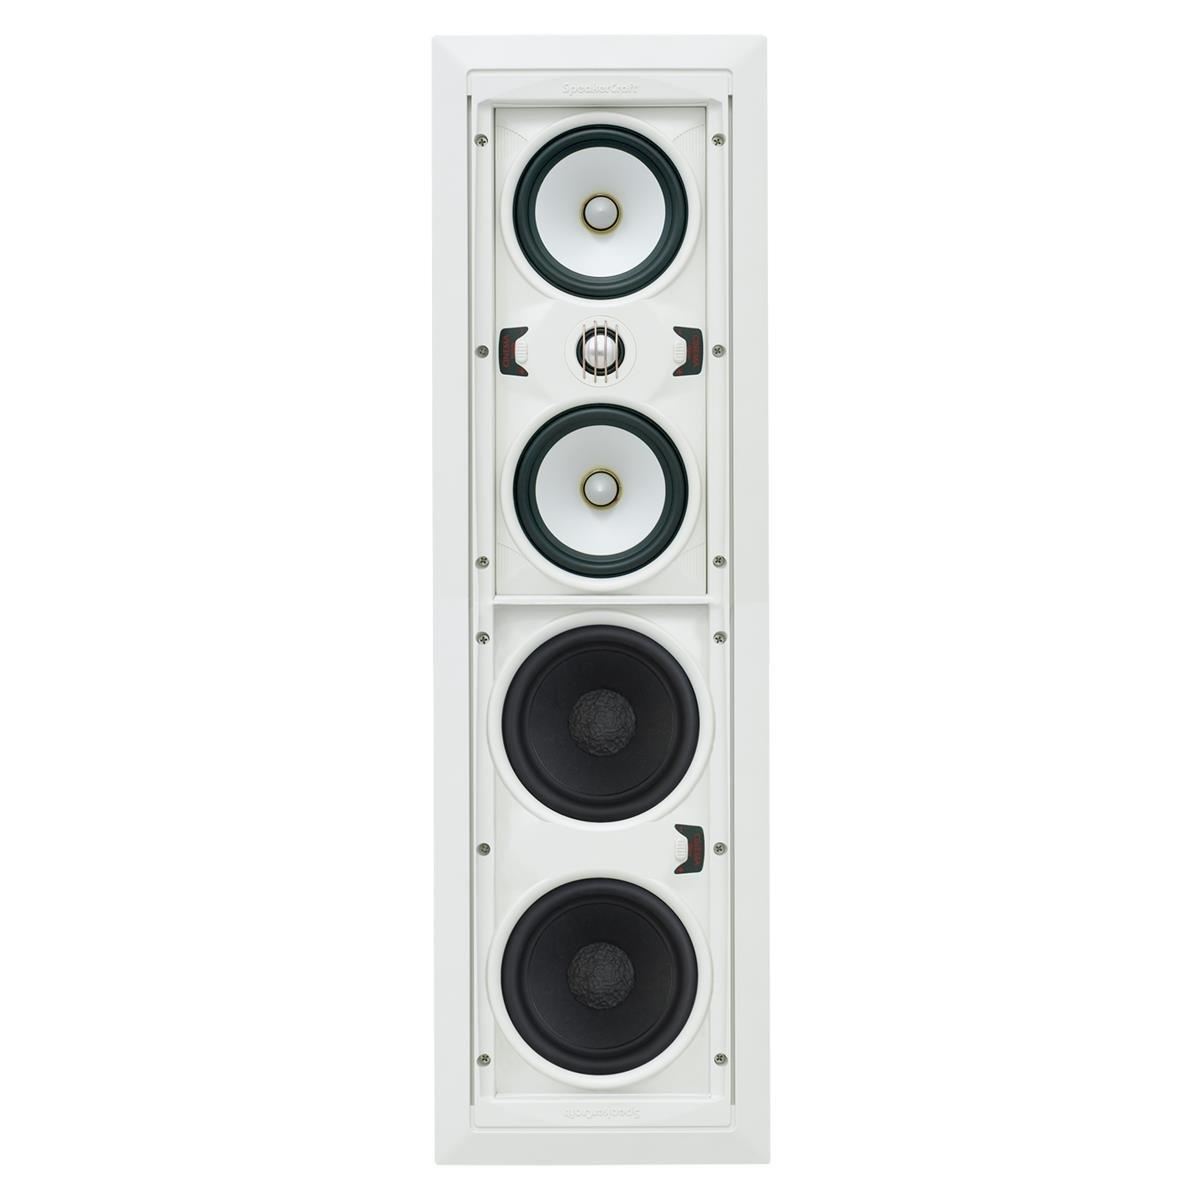 SpeakerCraft ASM71531 AIM Cinema Three In-Wall Speaker - Each (White) by SpeakerCraft